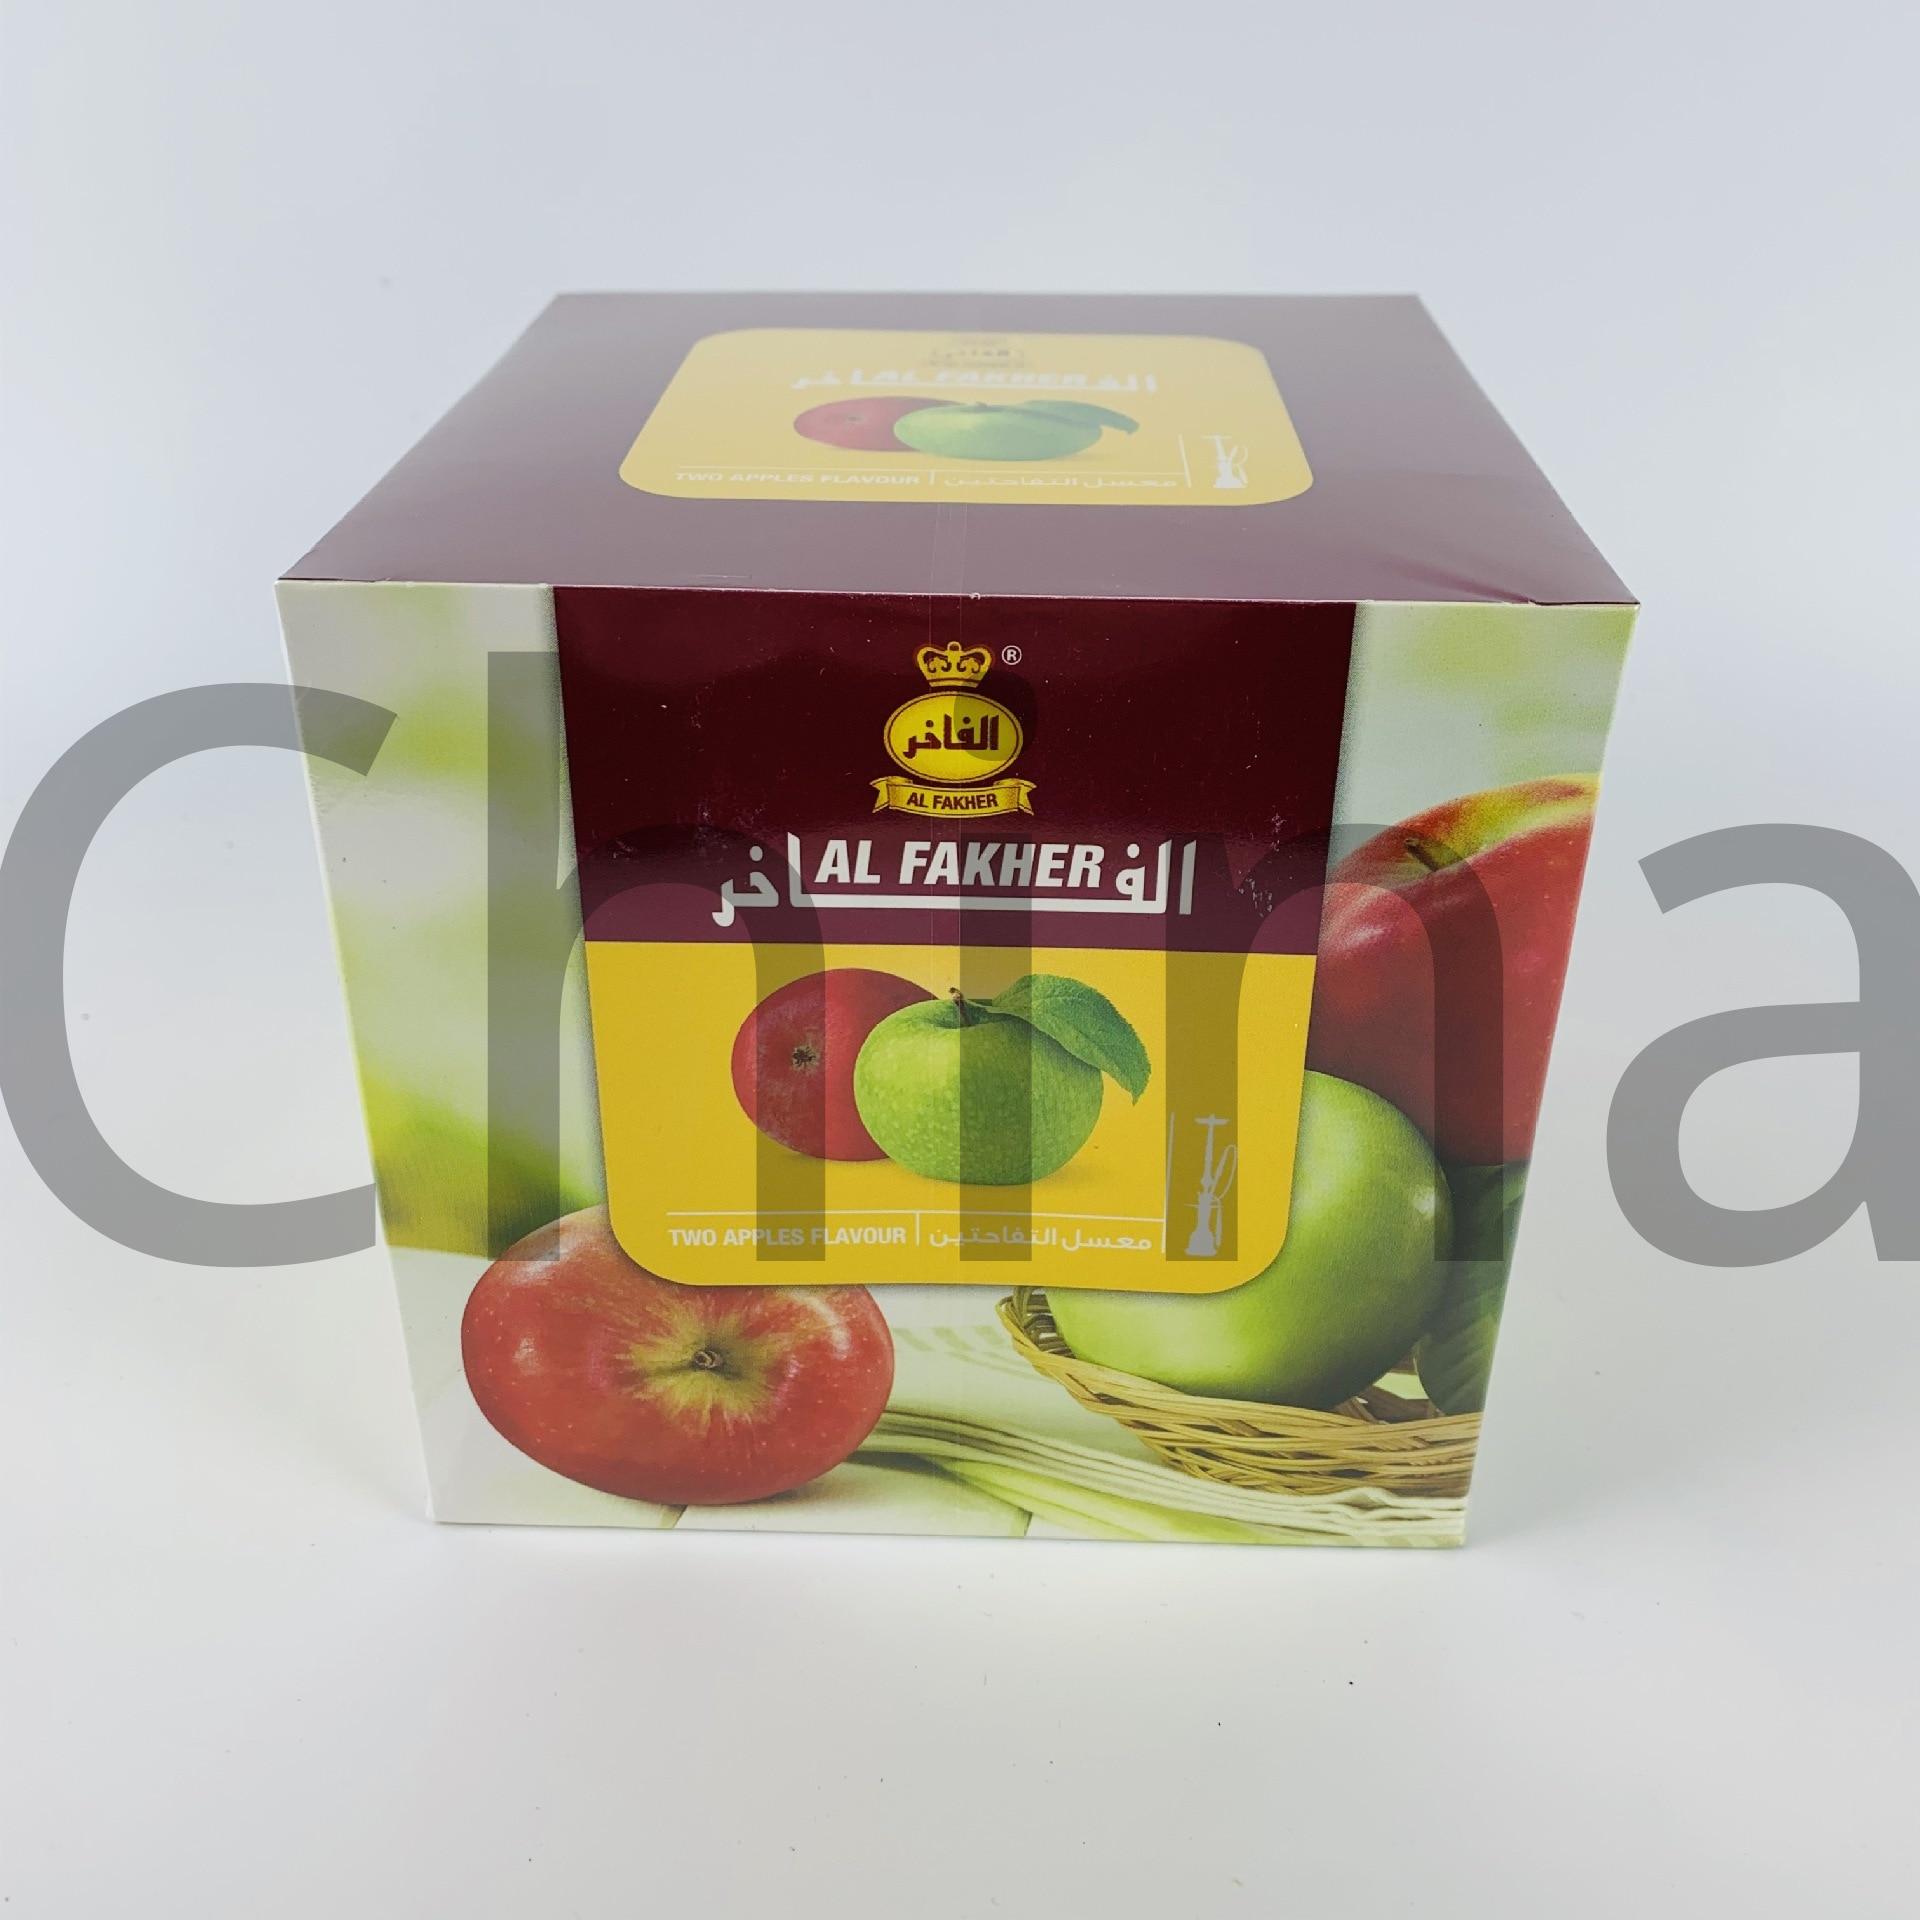 Original UAE Import Shisha Hookah Tobacco Fruity Flavor Free Tar Nicotine Hookah Accessories